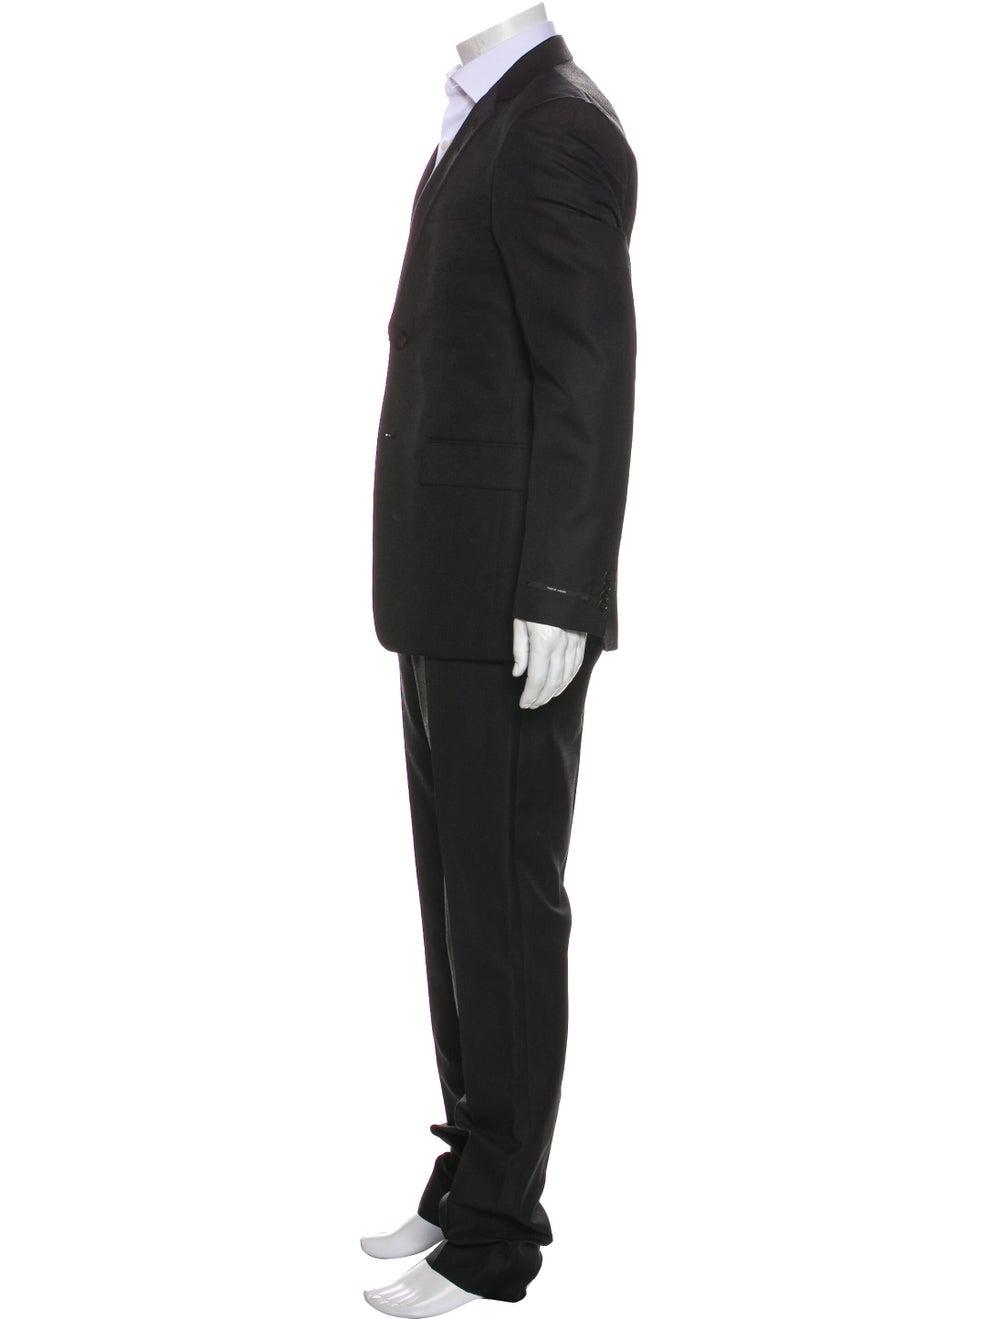 Tiger of Sweden Two-Piece Suit Black - image 2